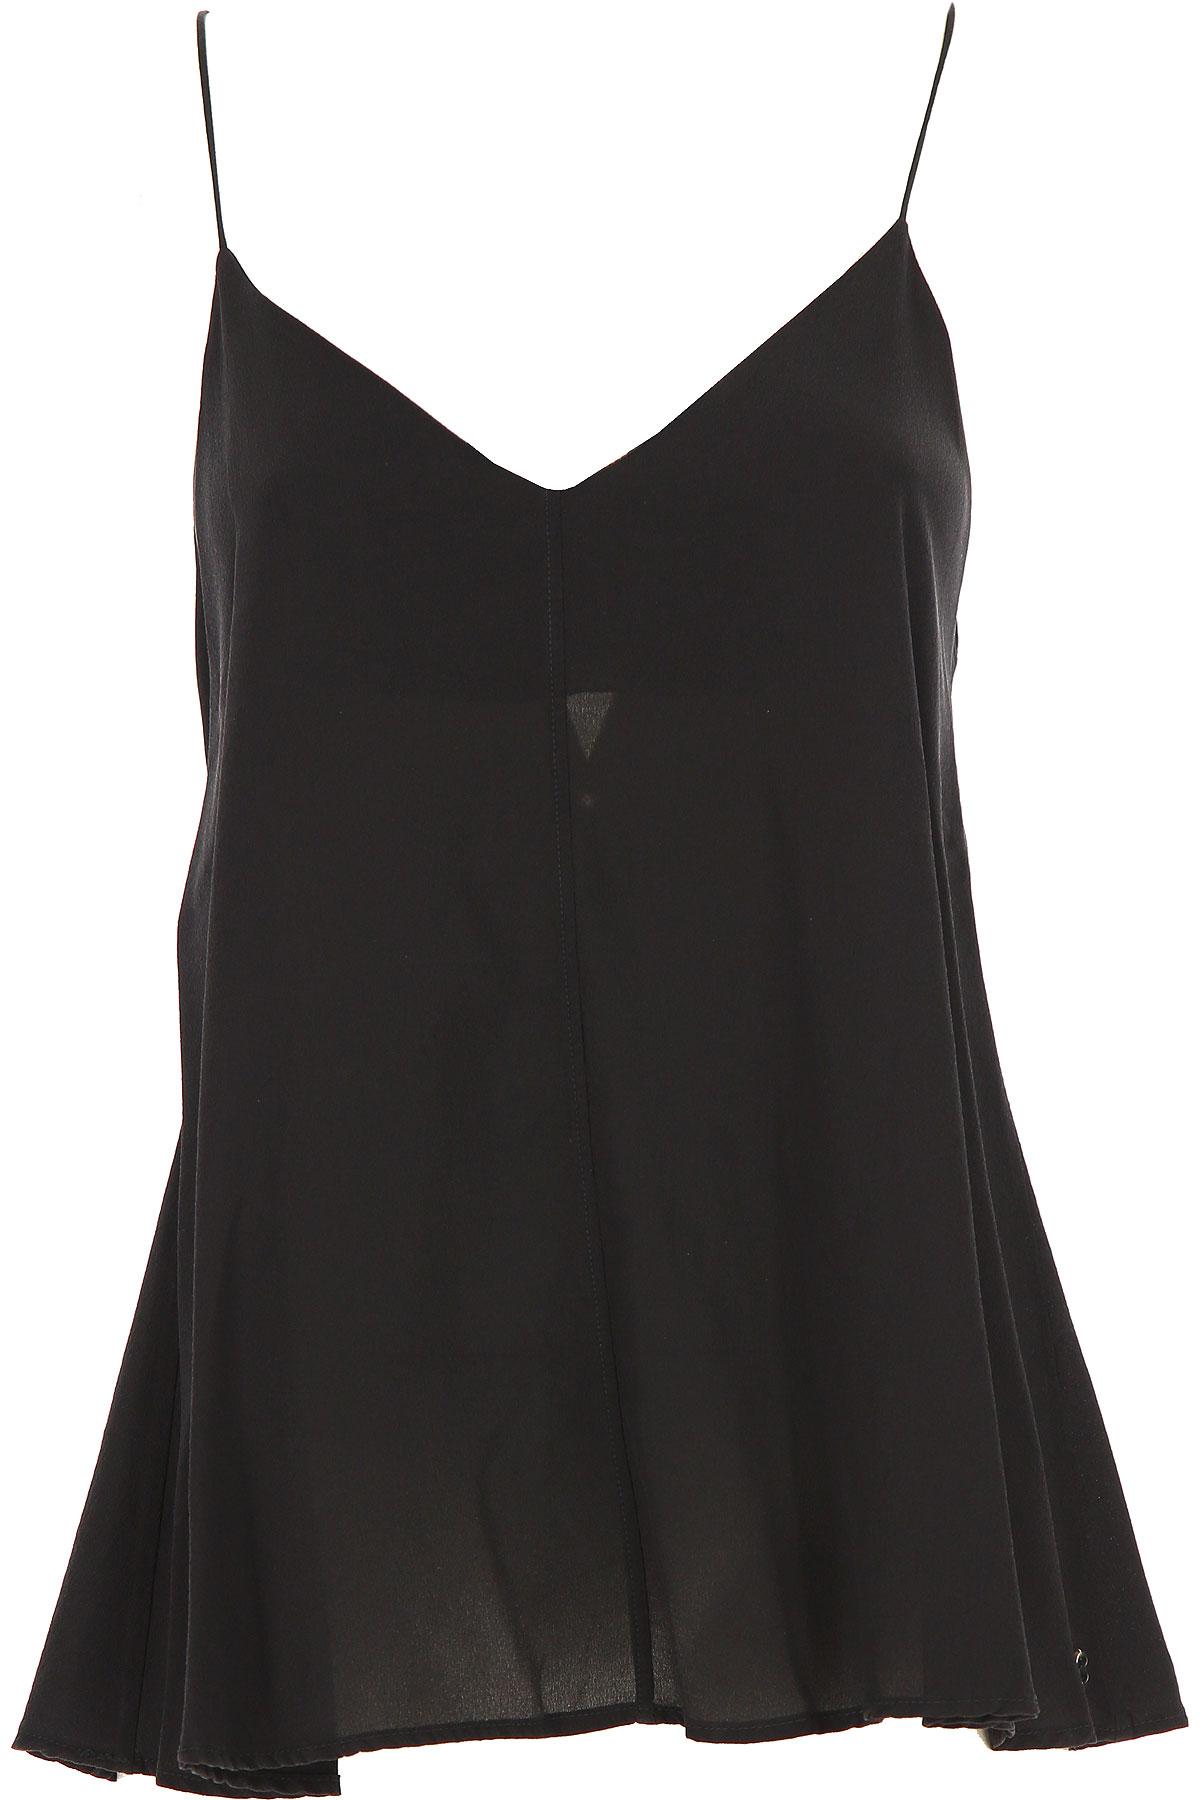 Image of Ottodame Top for Women On Sale, Black, Silk, 2017, US 6 - I 42 - GB 10 - F 38 US 8 - I 44 - GB 12 - F 40 US 10 - I 46 - GB 14 - F 42